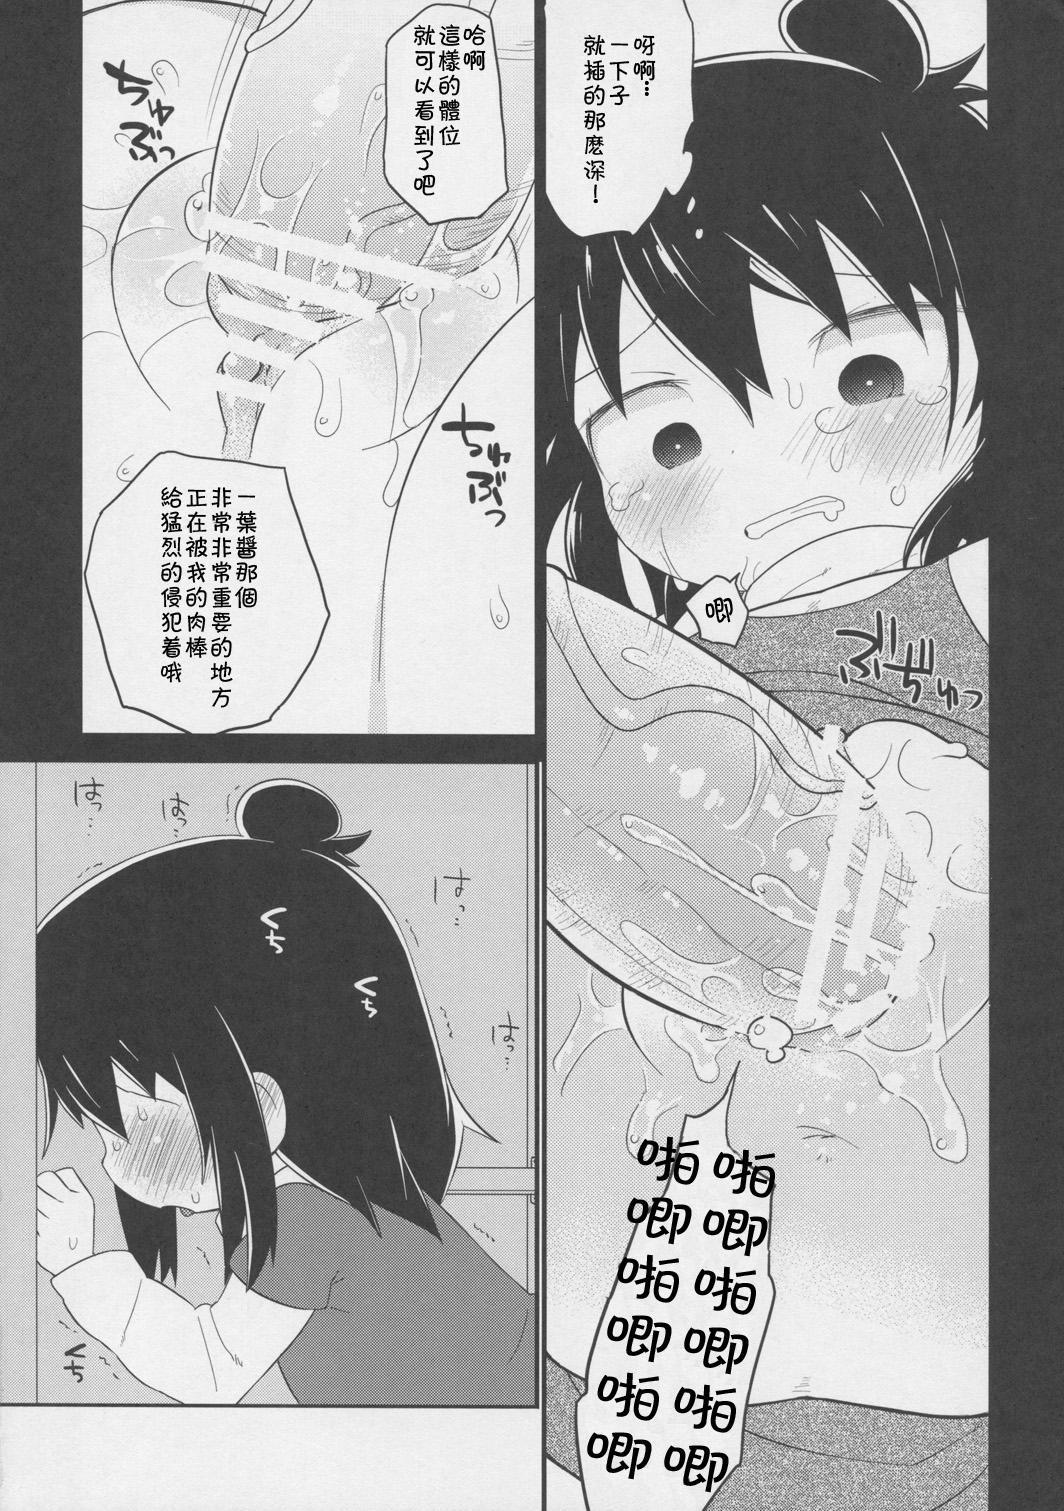 Sanjo no Yasumijikan 7